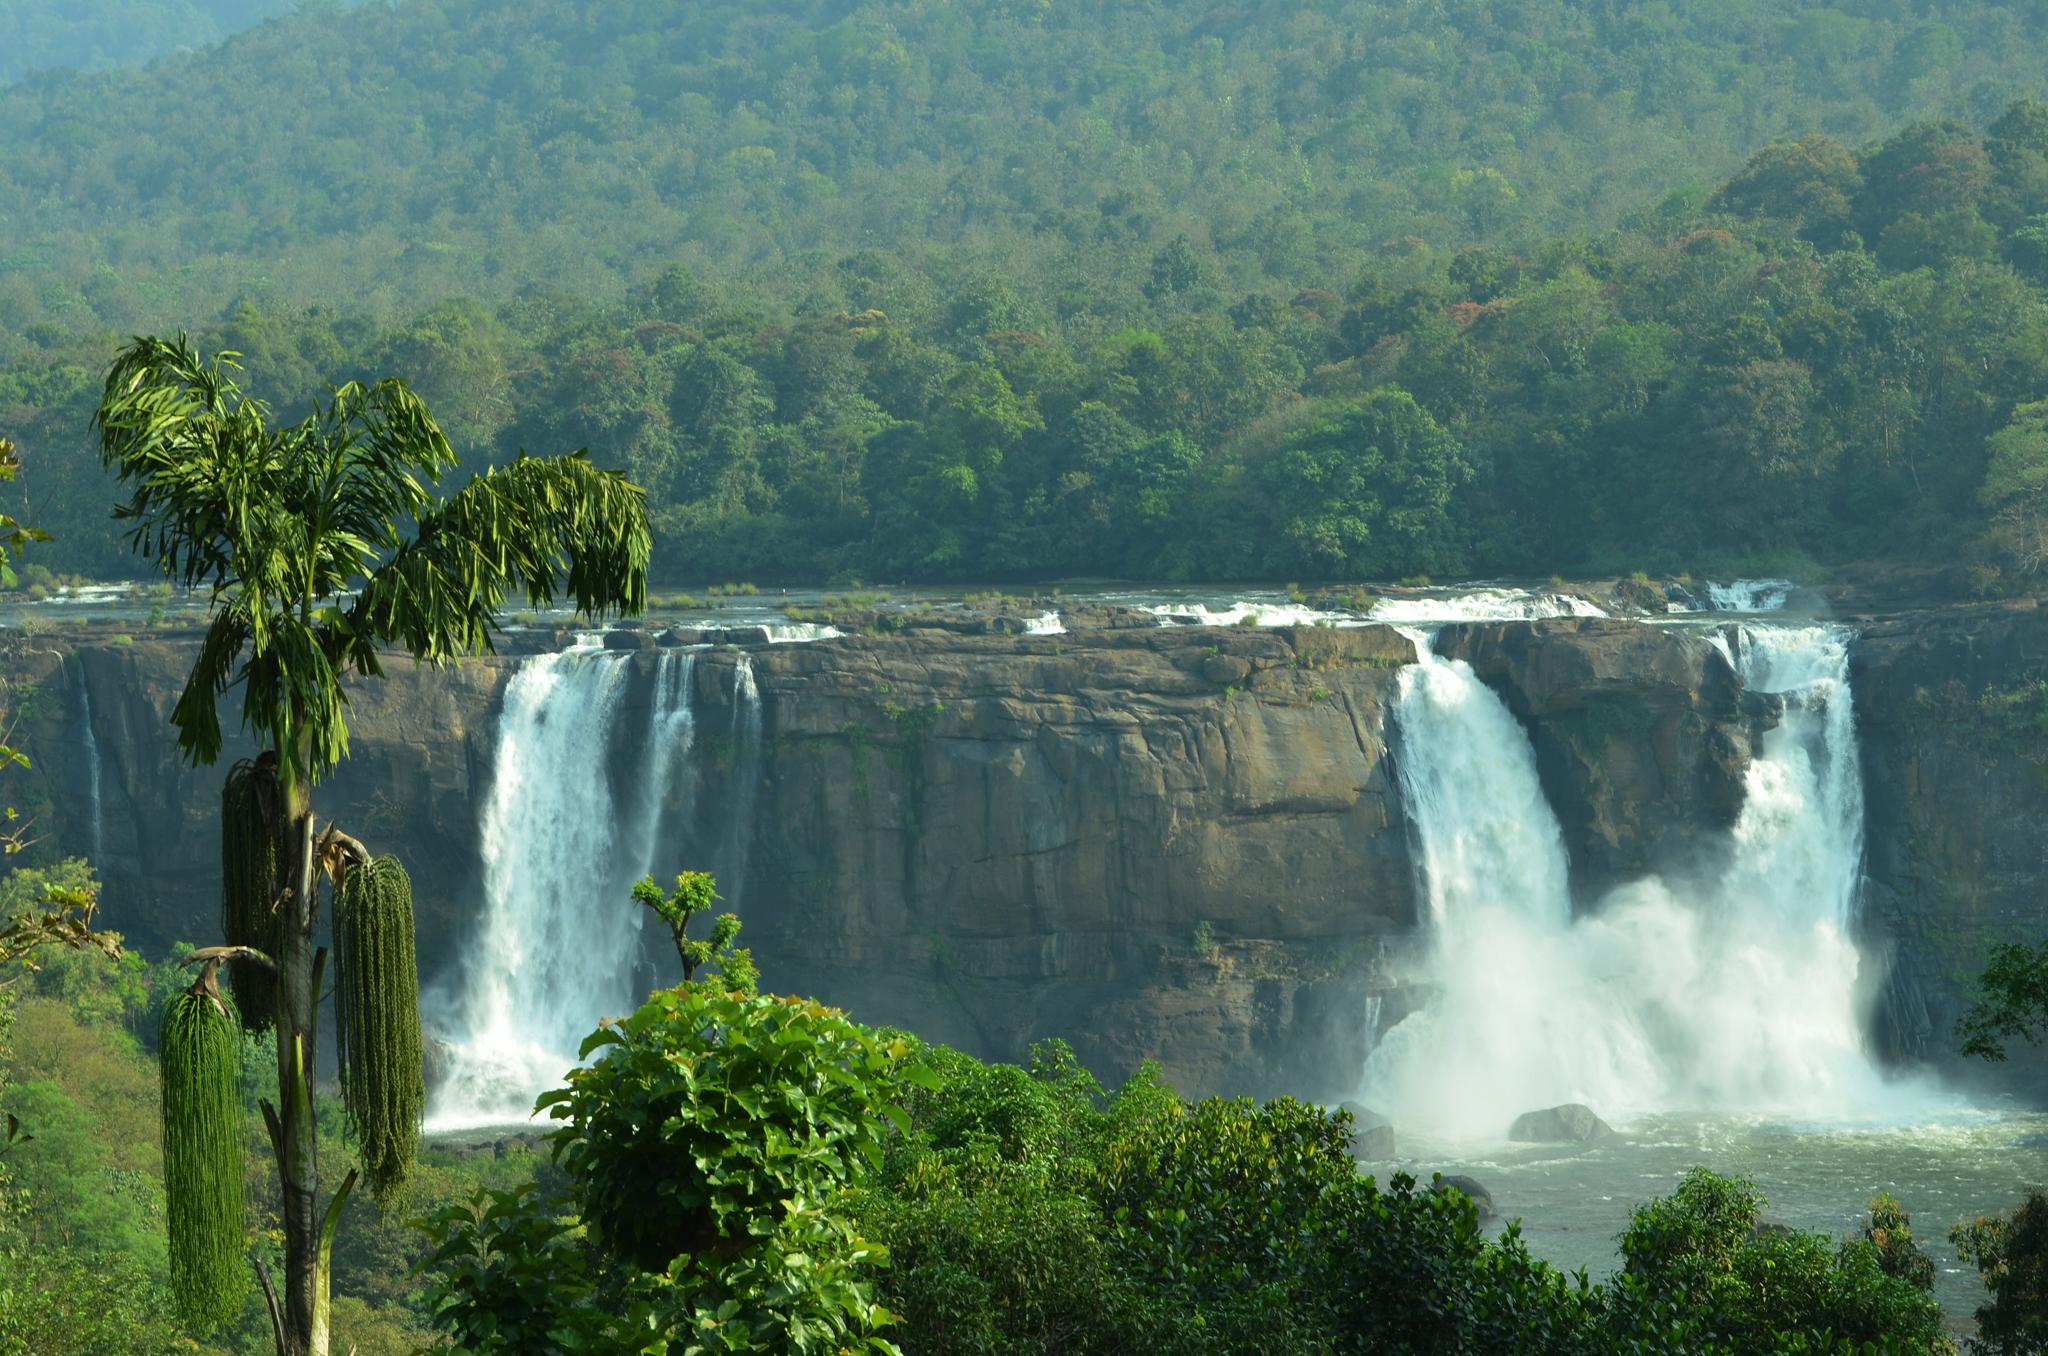 File:Athirappilly Waterfalls 2.JPG - Wikimedia Commons